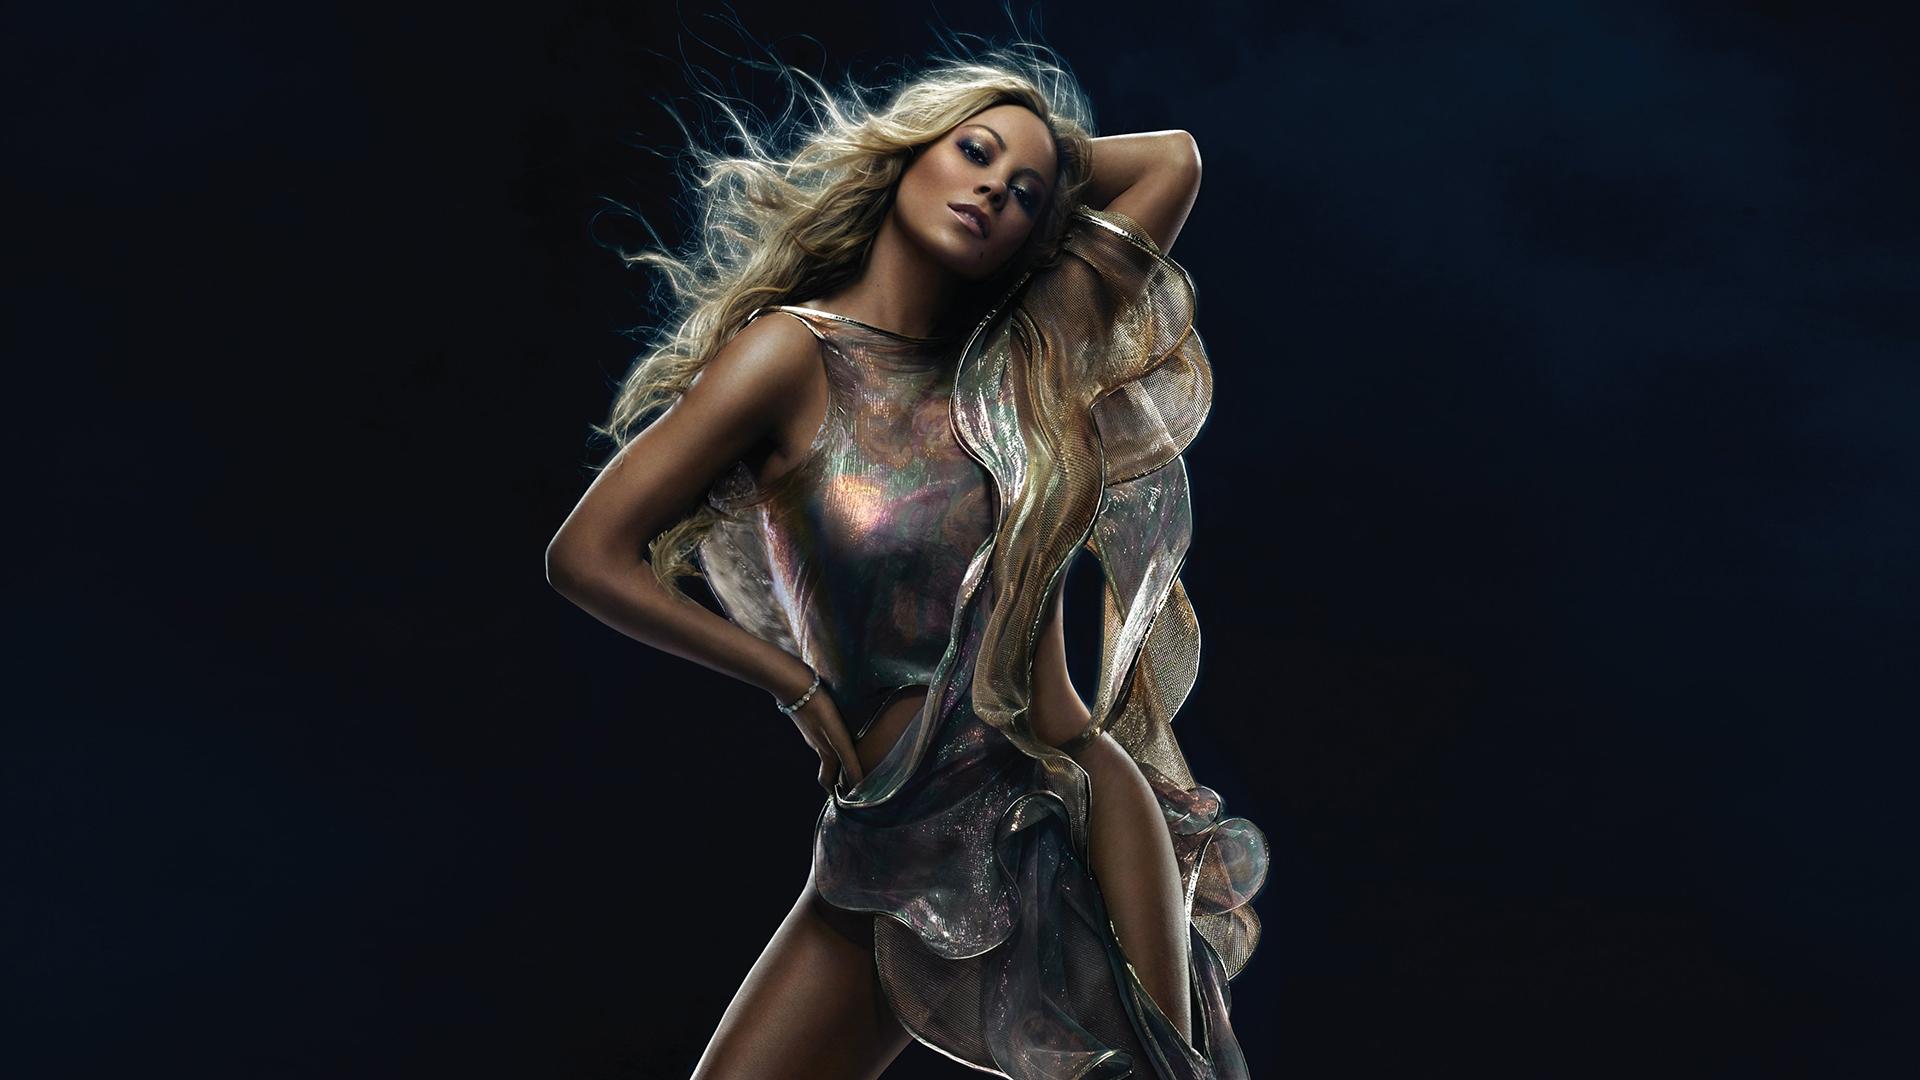 Mariah Carey Backdrop Wallpaper